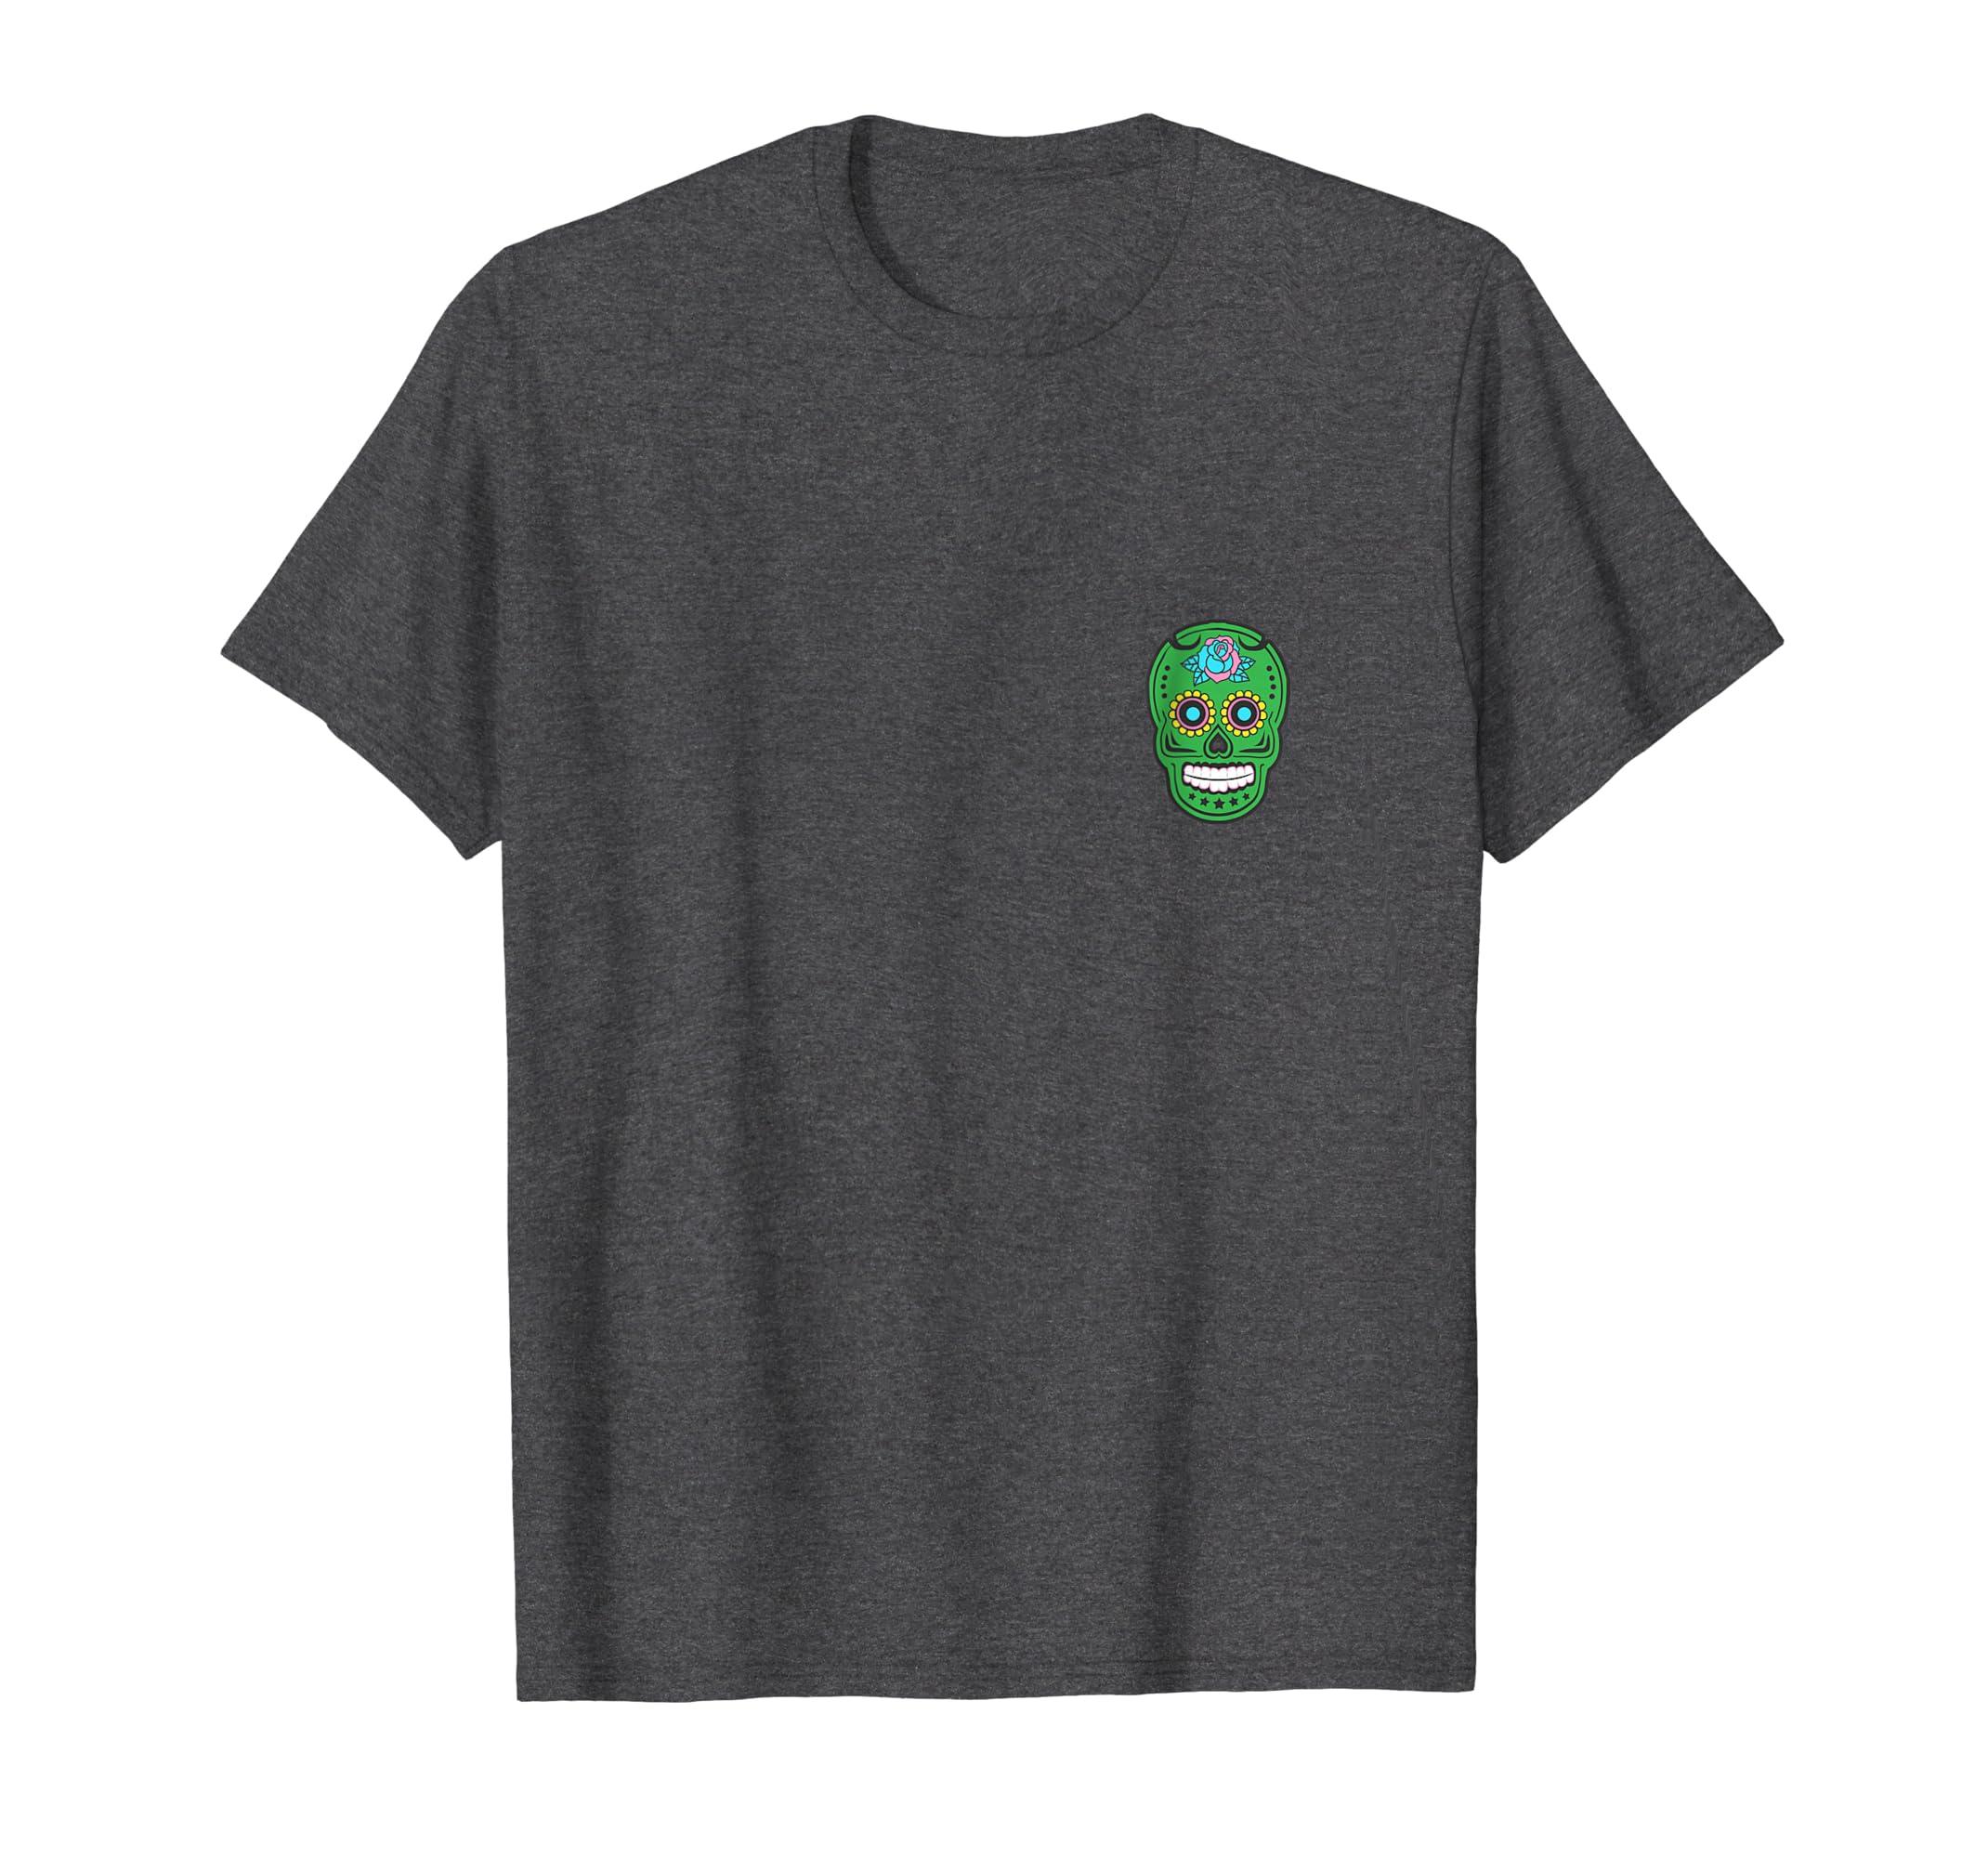 1a541415 Amazon.com: Suspicious Sugar Skull Logo Green Men Women Antwerp T Shirt:  Clothing